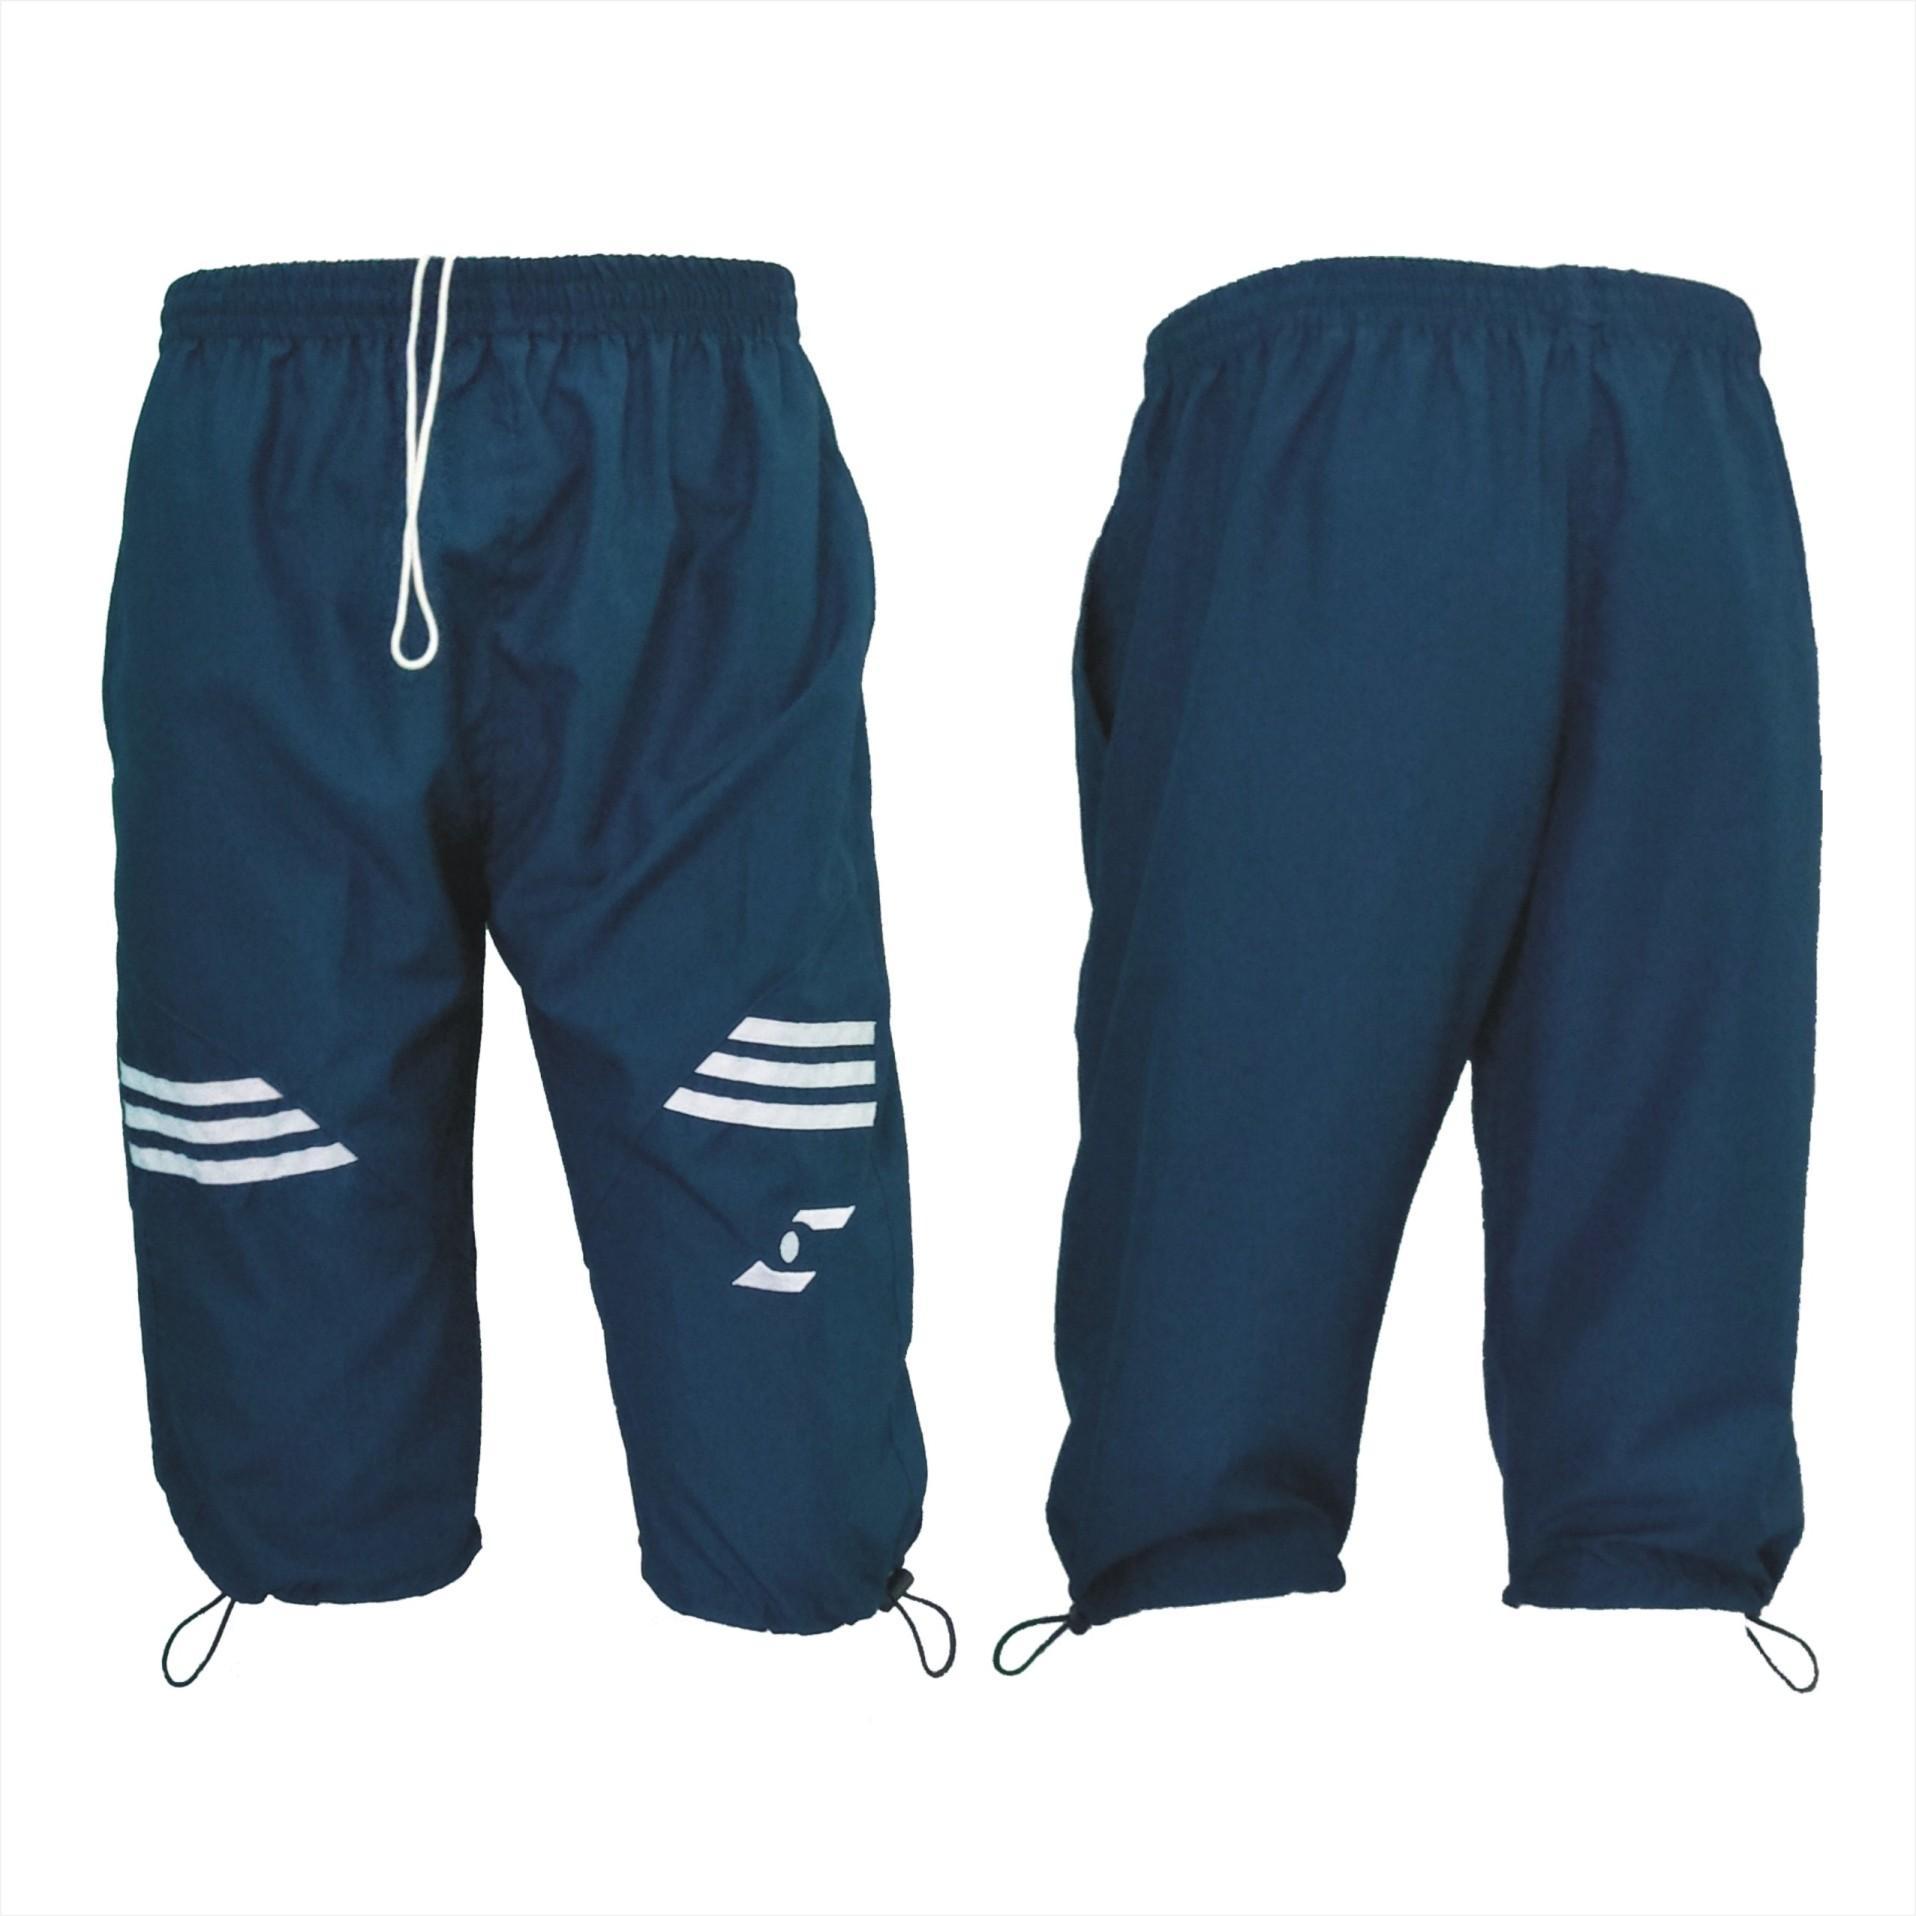 Celana Sontok 3/4 TE 348 Biru dan Hitam Tiga perempat Training